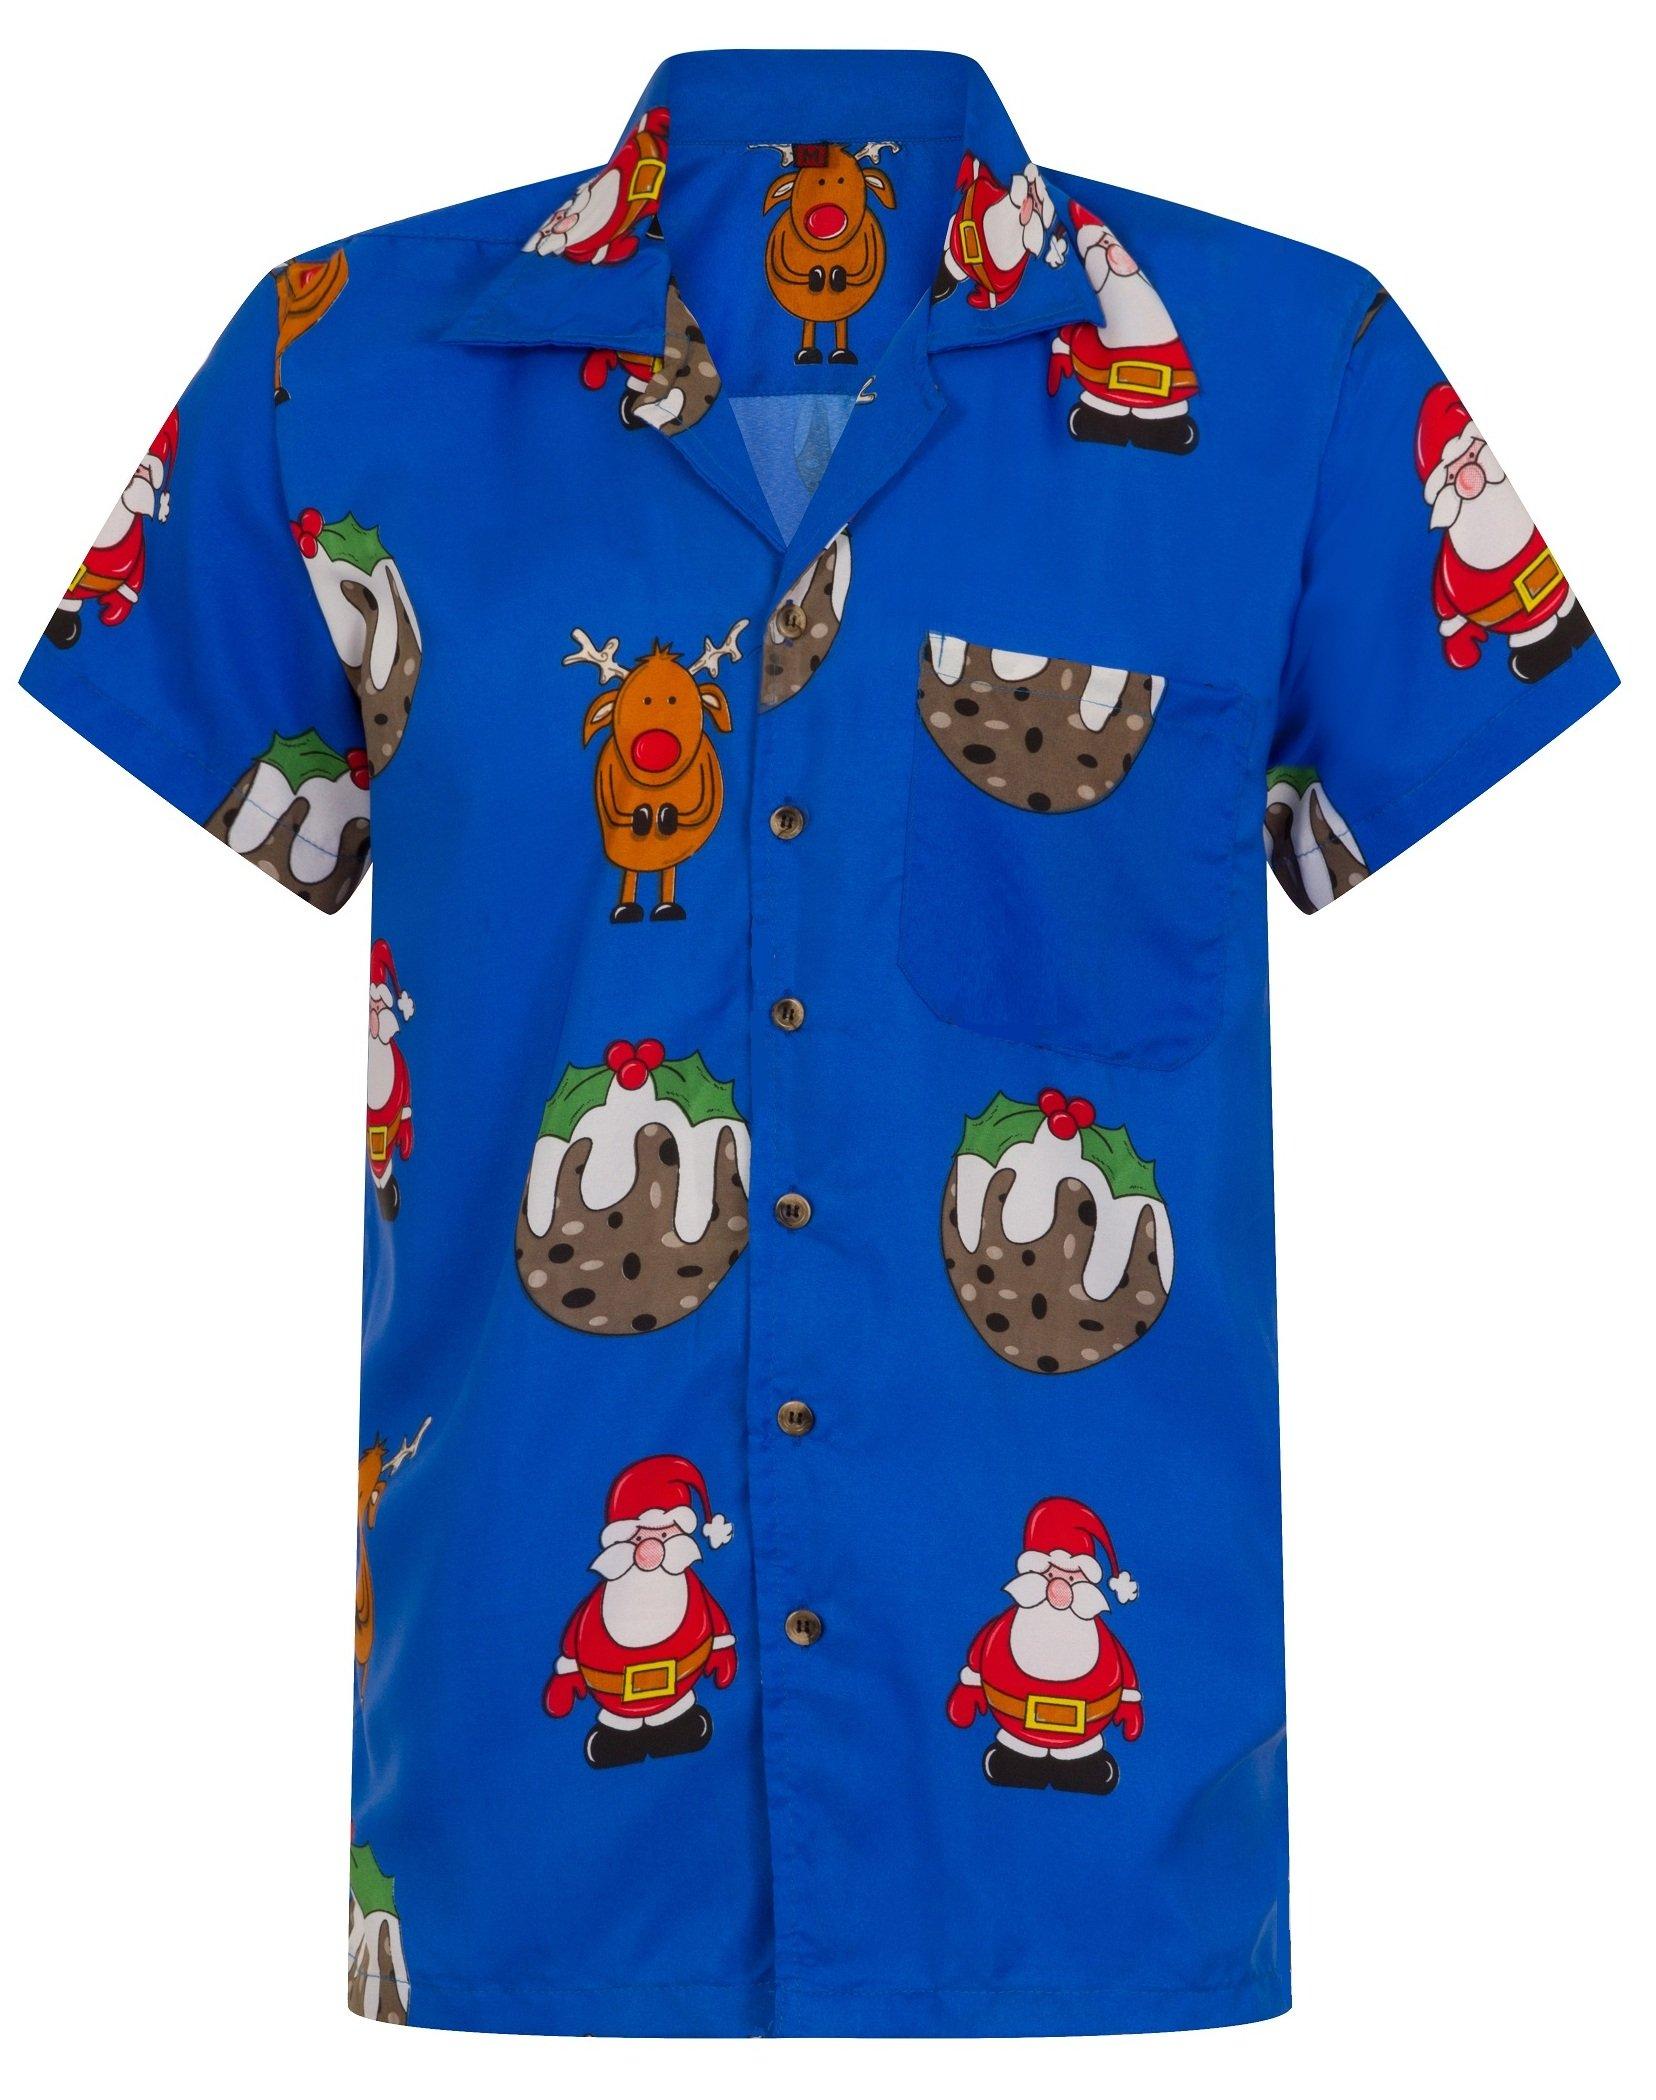 Christmas In Hawaii Party.Christmas Hawaiian Shirt Mens Santa Loud Hawaii Reindeer Xmas Party S M L Xl Xxl